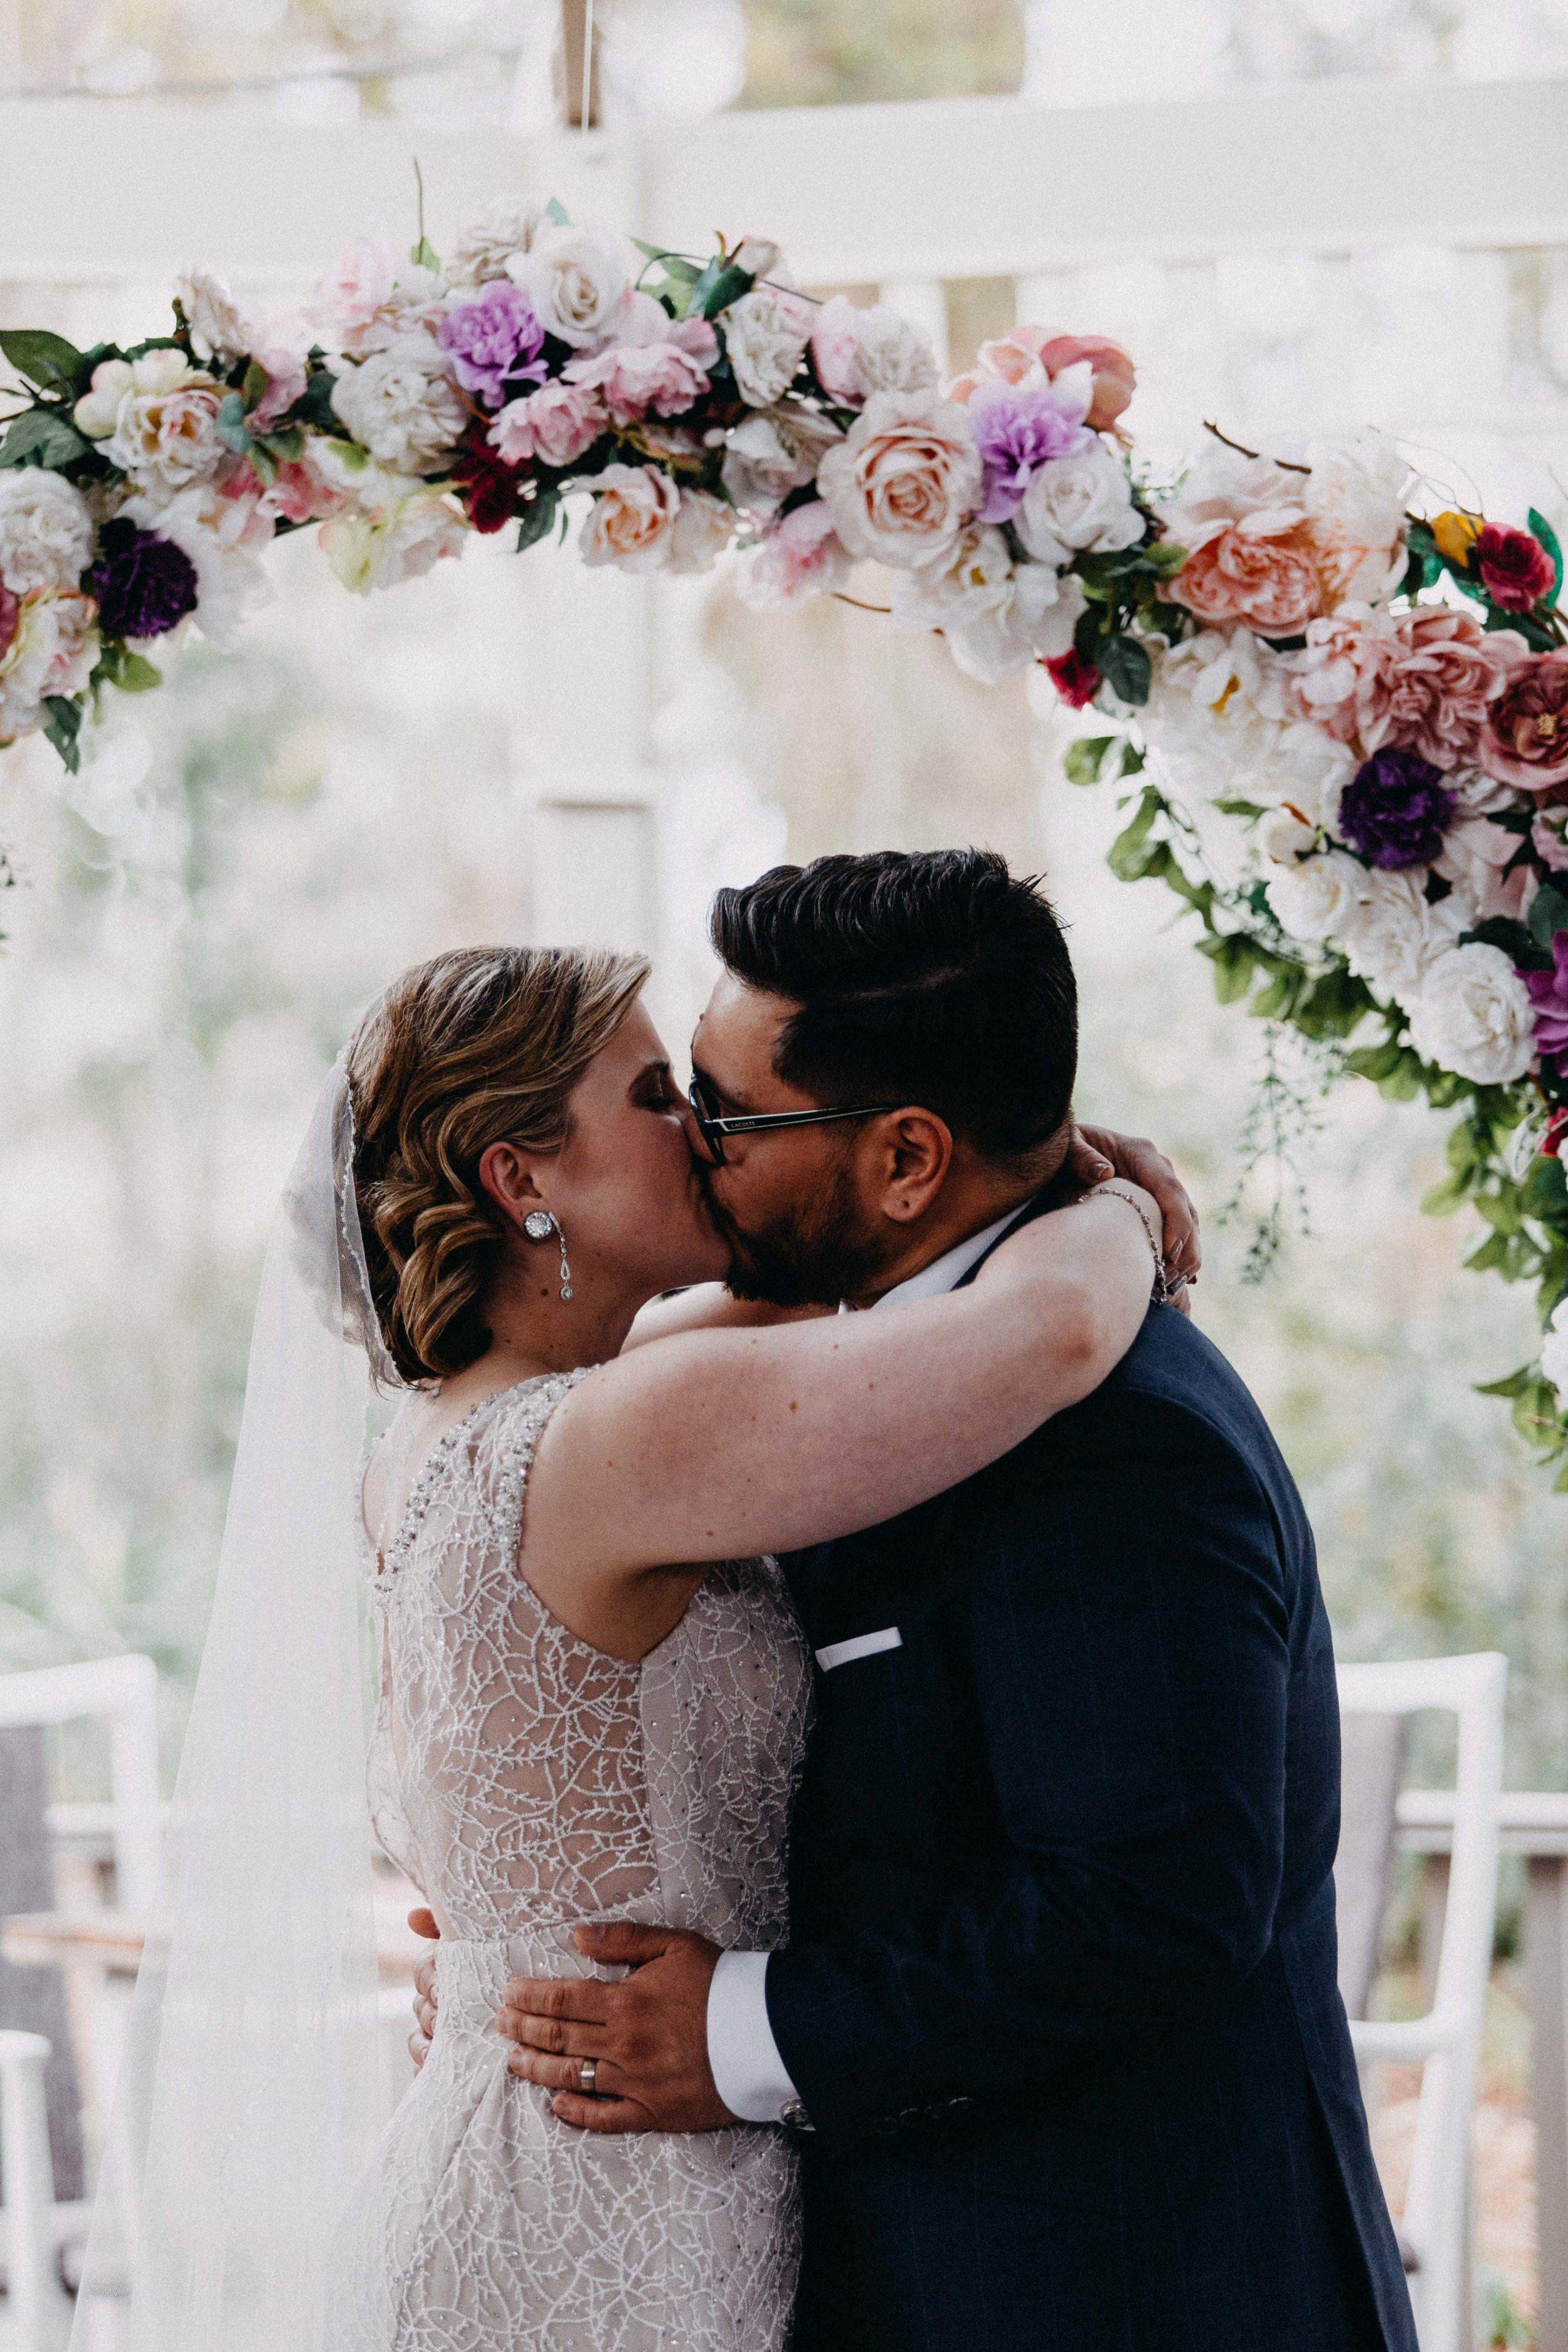 appin-house-wedding-macarthur-www.emilyobrienphotography.net-89.jpg